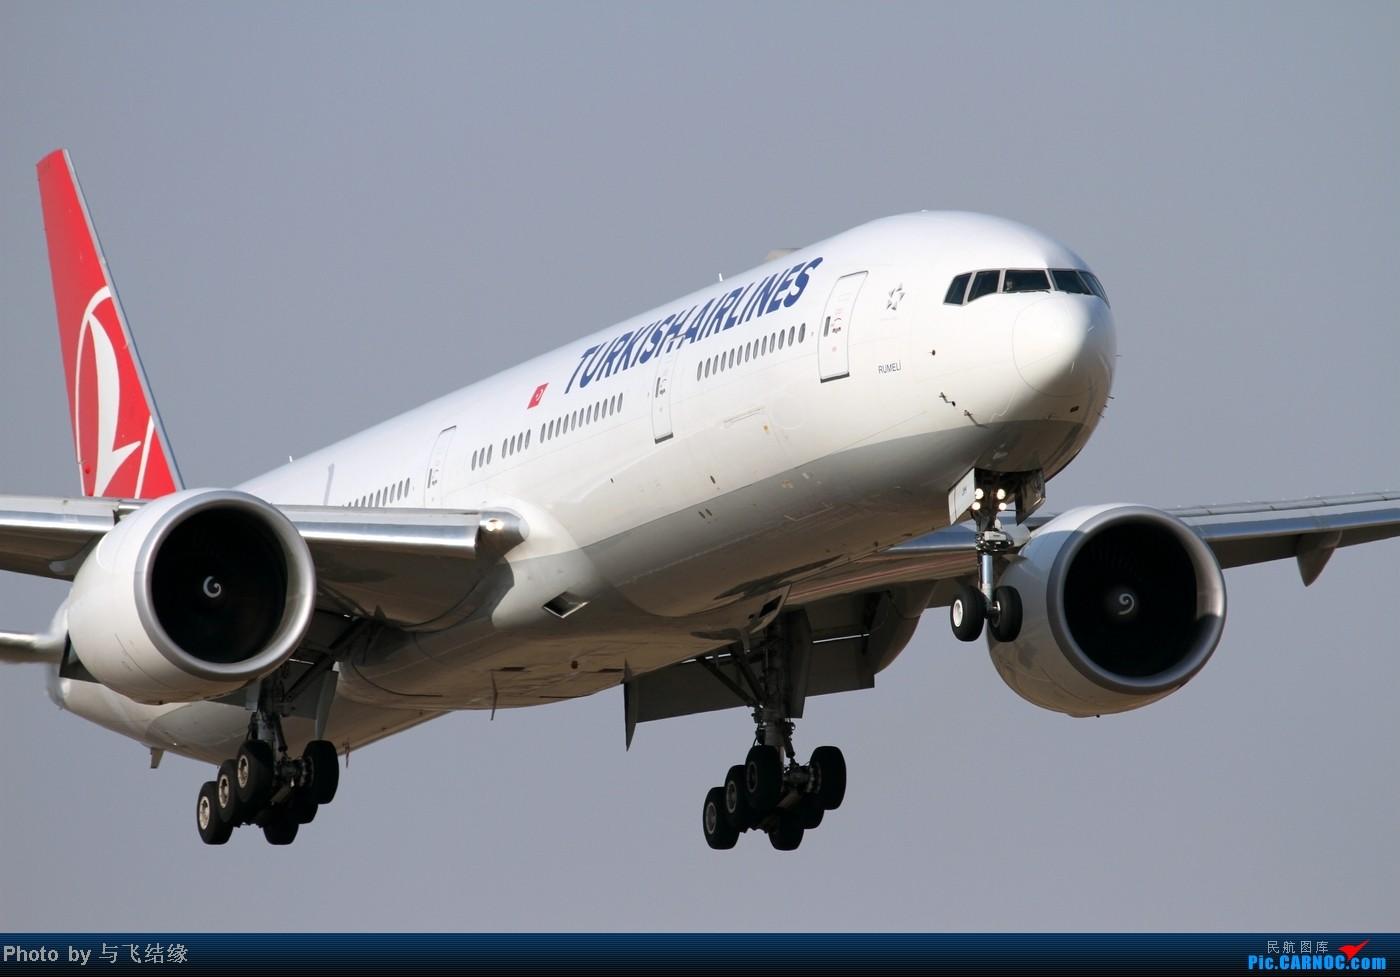 Re:[原创]喜欢777吗?九家航空公司的777大头近进照,777控们进来看看。 BOEING 777-300 TC-JJH 中国北京首都机场